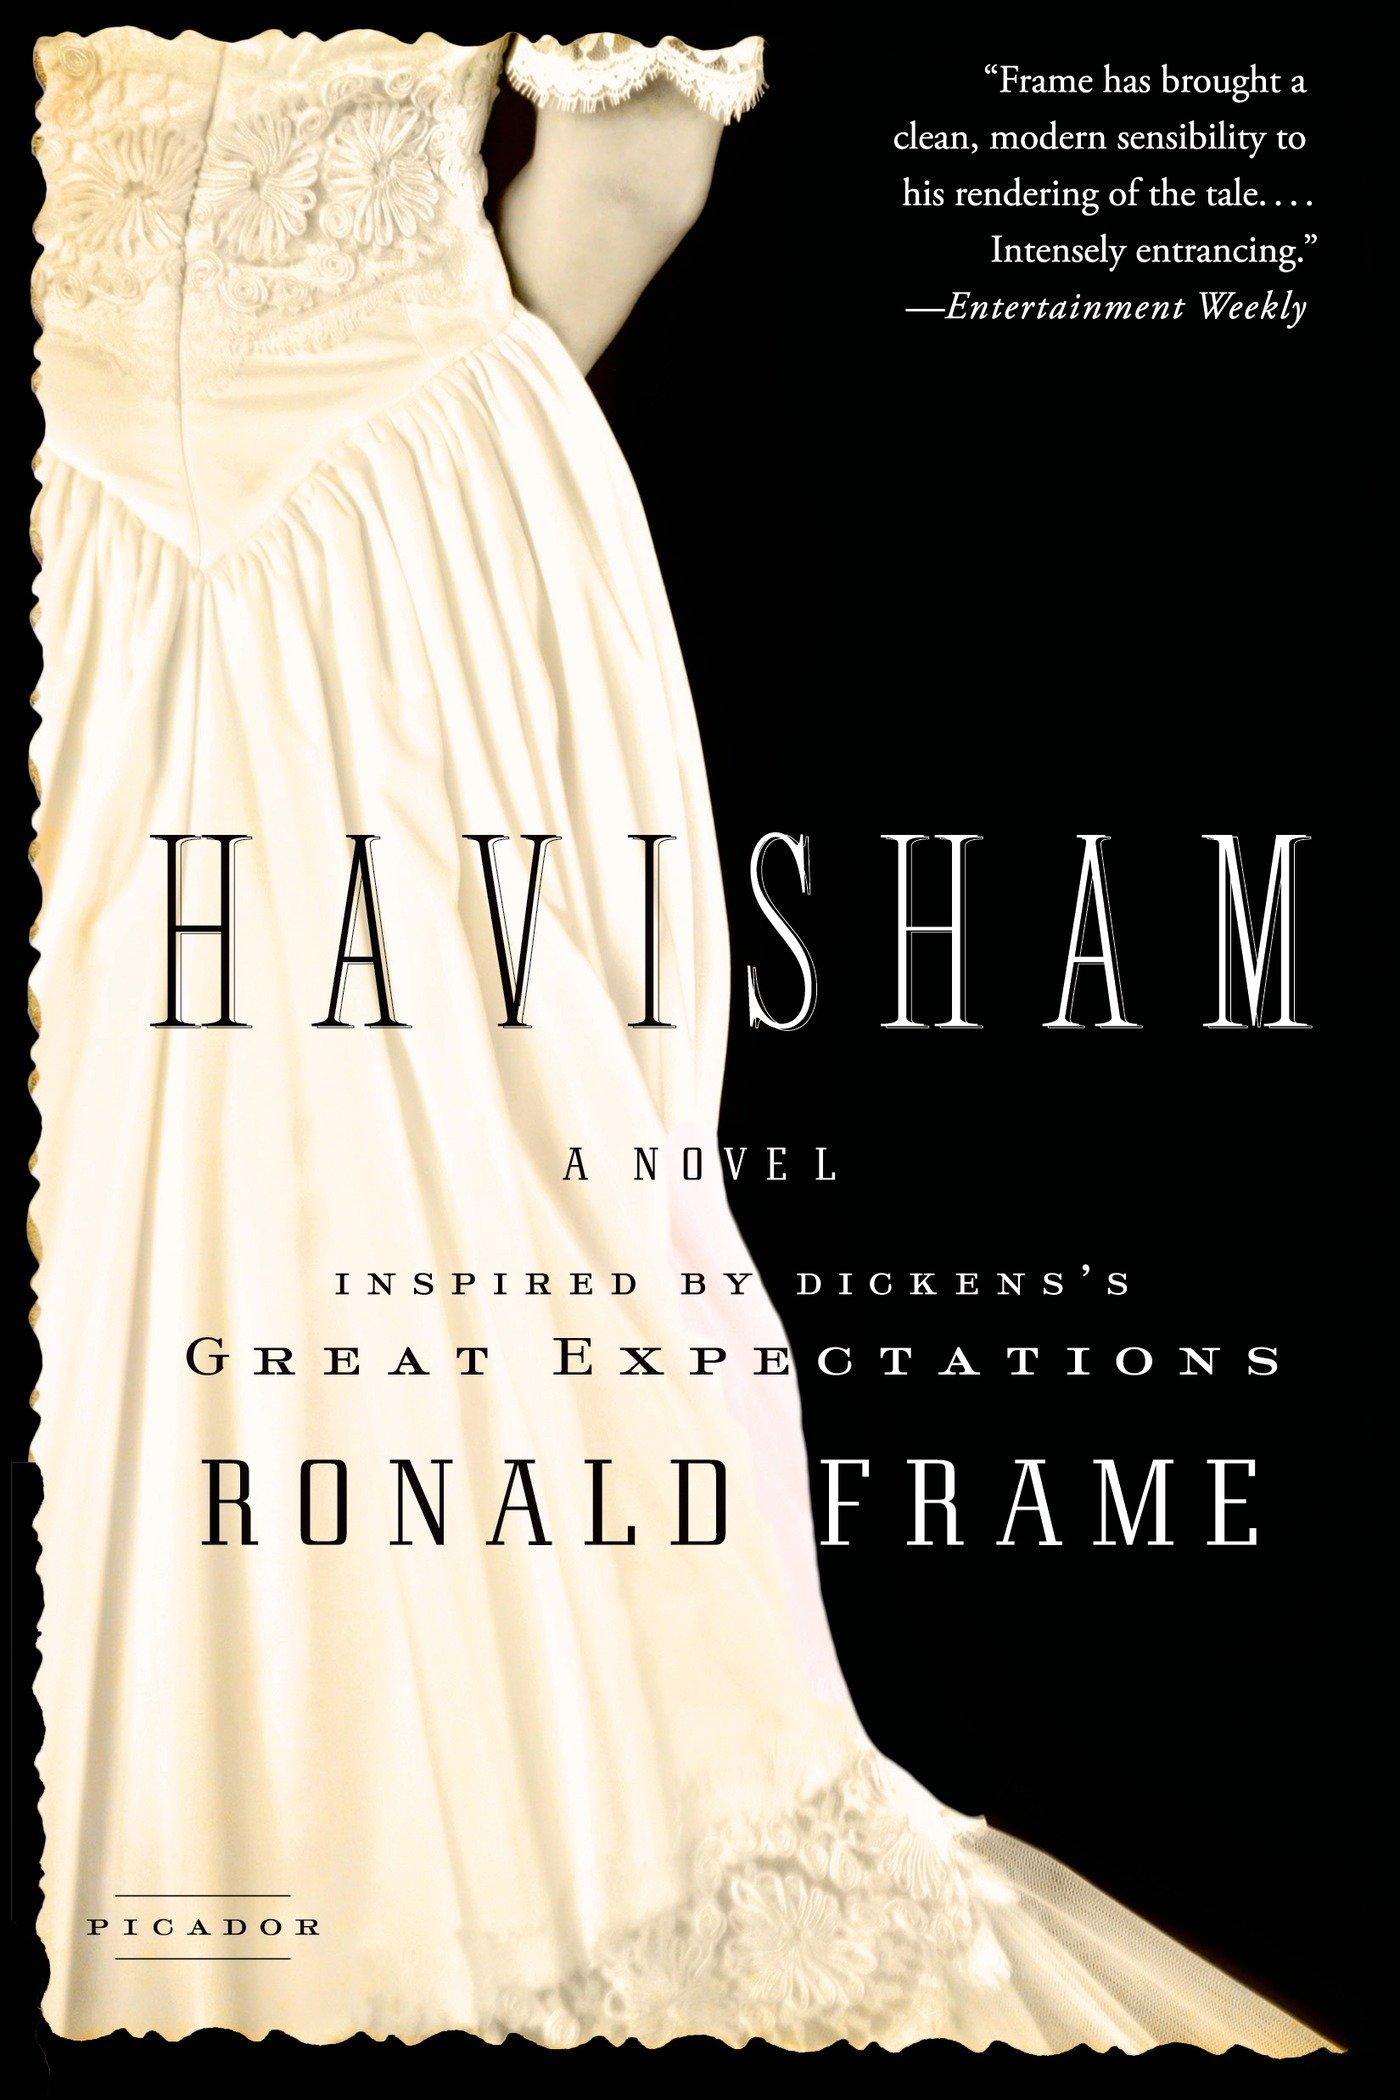 Havisham: A Novel Inspired by Dickenss Great Expectations ...